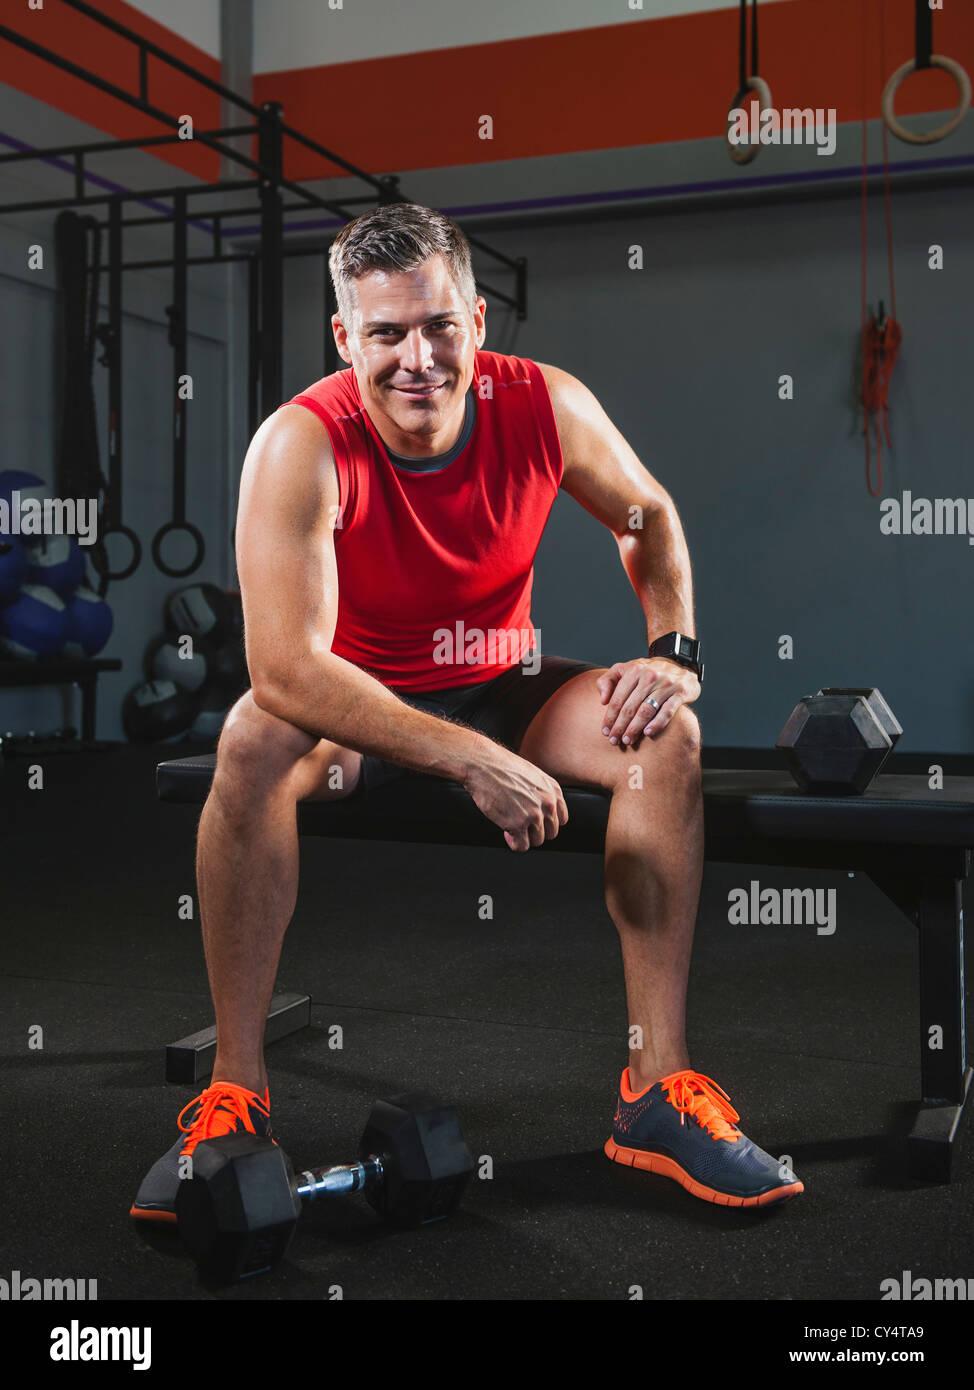 USA, California, Laguna Niguel, Mature man taking break from exercising - Stock Image